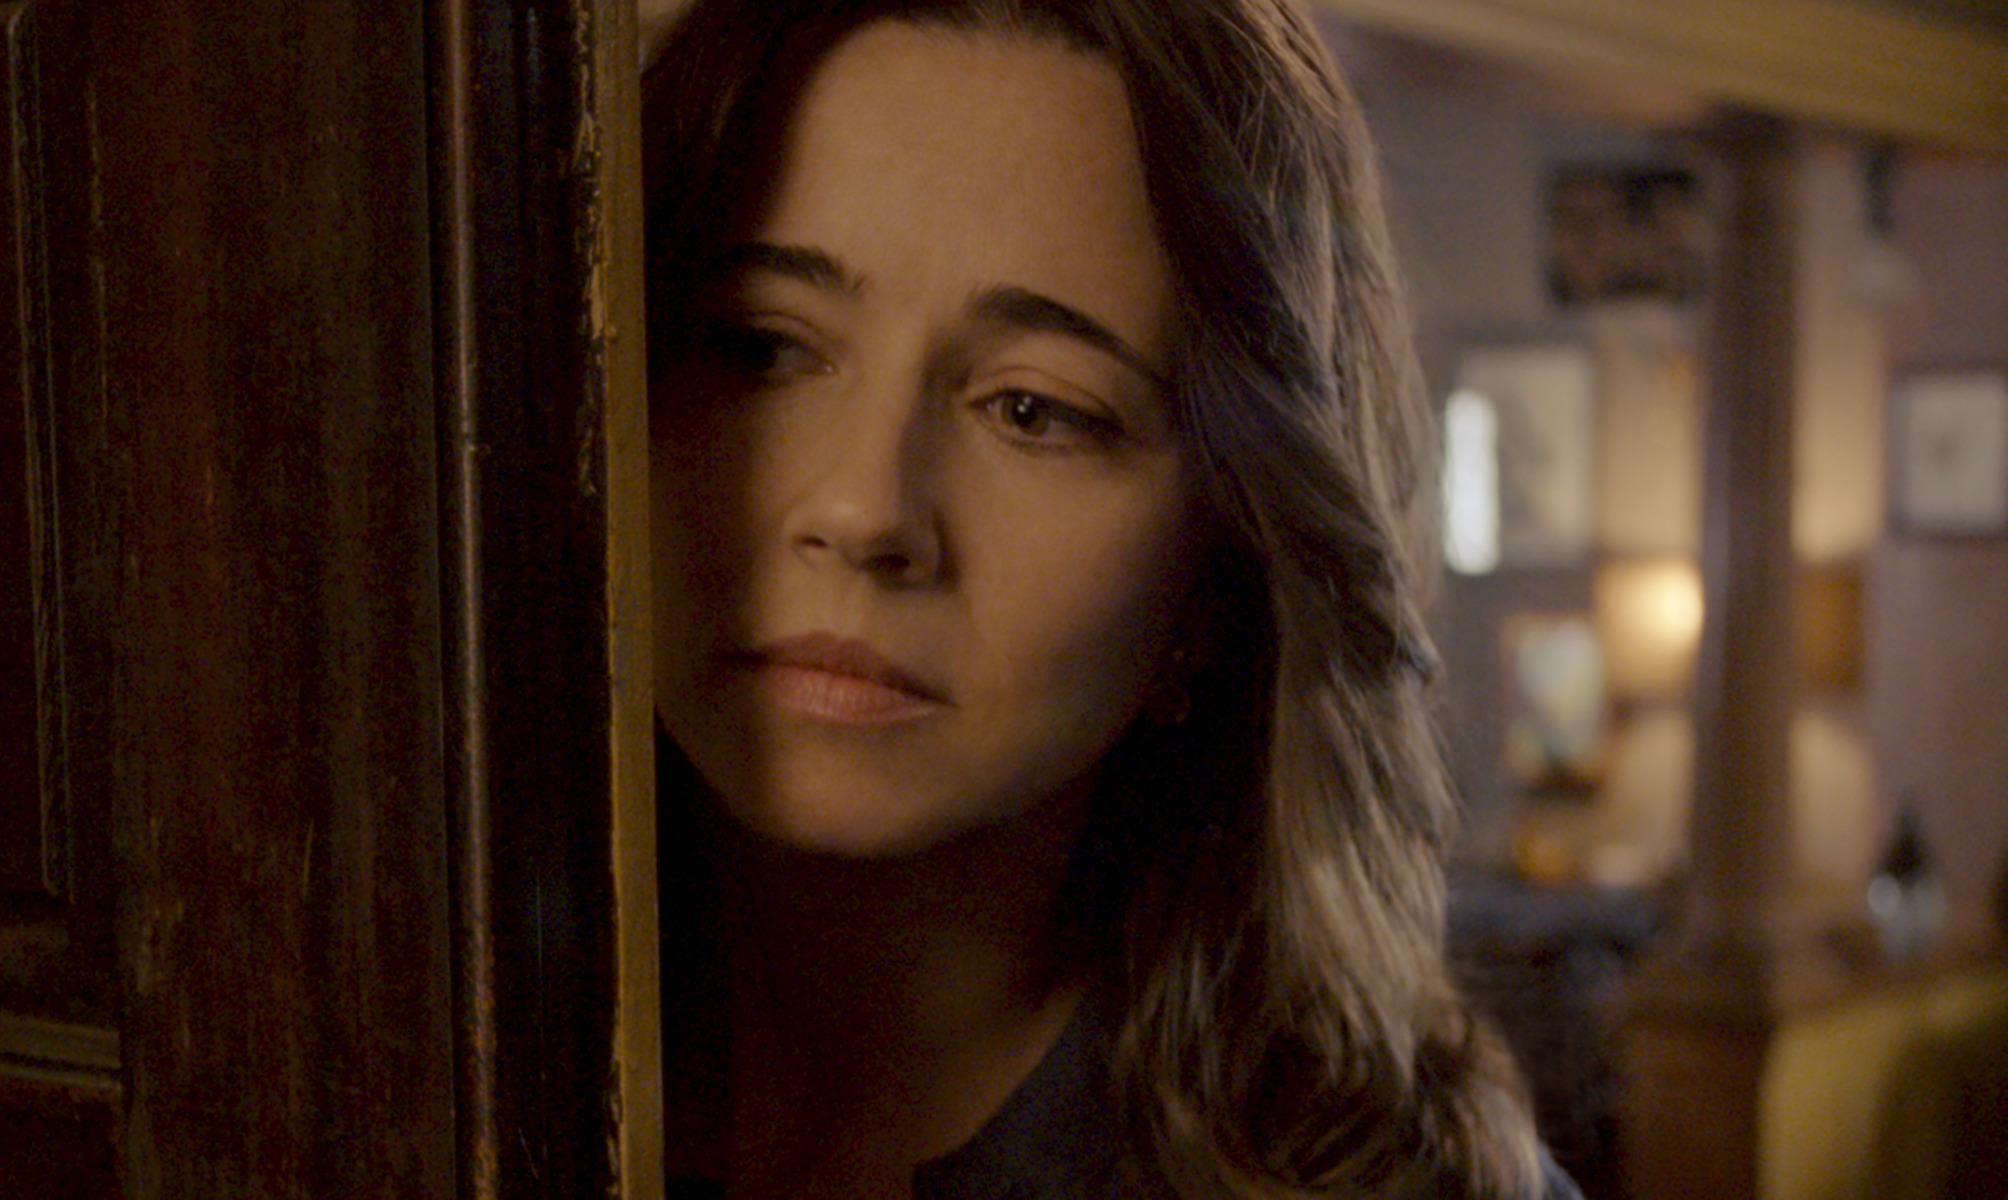 Home video: 'The Curse of La Llorona' now on digital